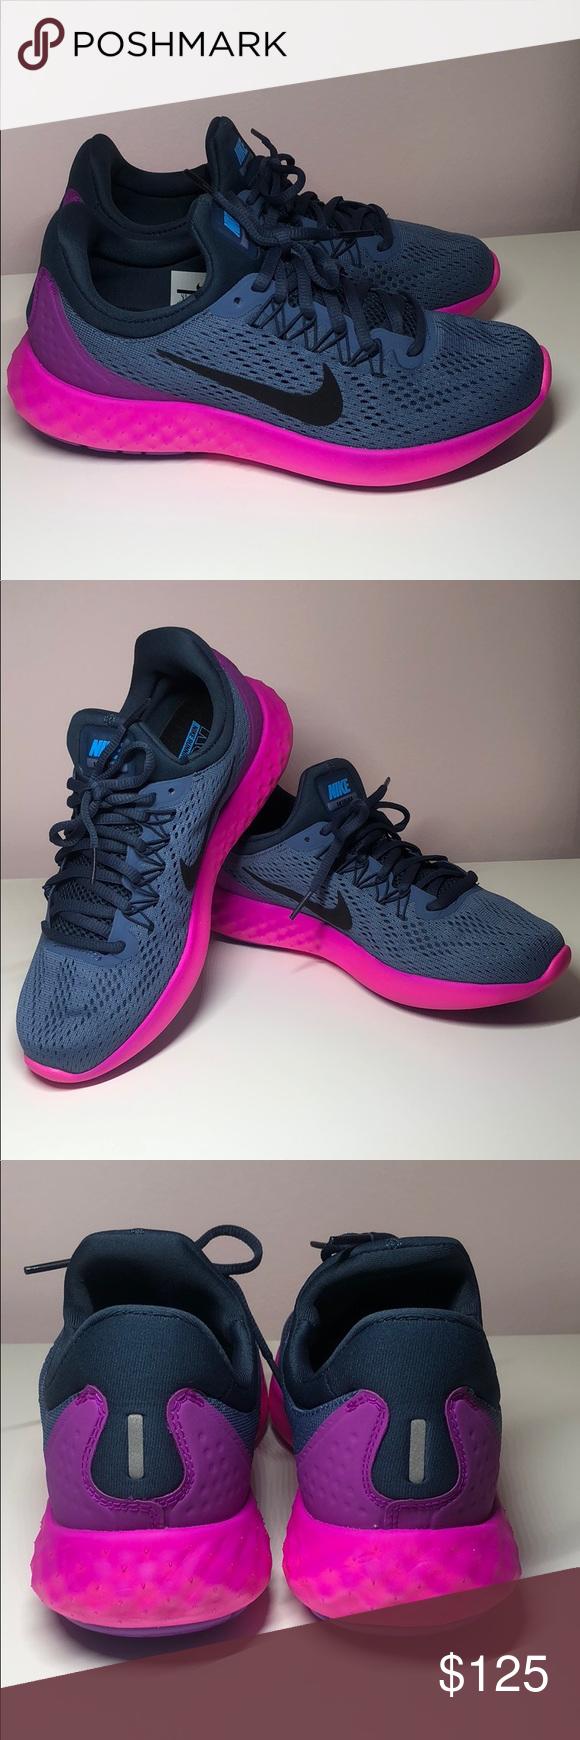 Photo of NIKE Women's Lunar Skyelux Sneakers *7.5 NIB NIKE Women's Lunar Skyelux Snea…